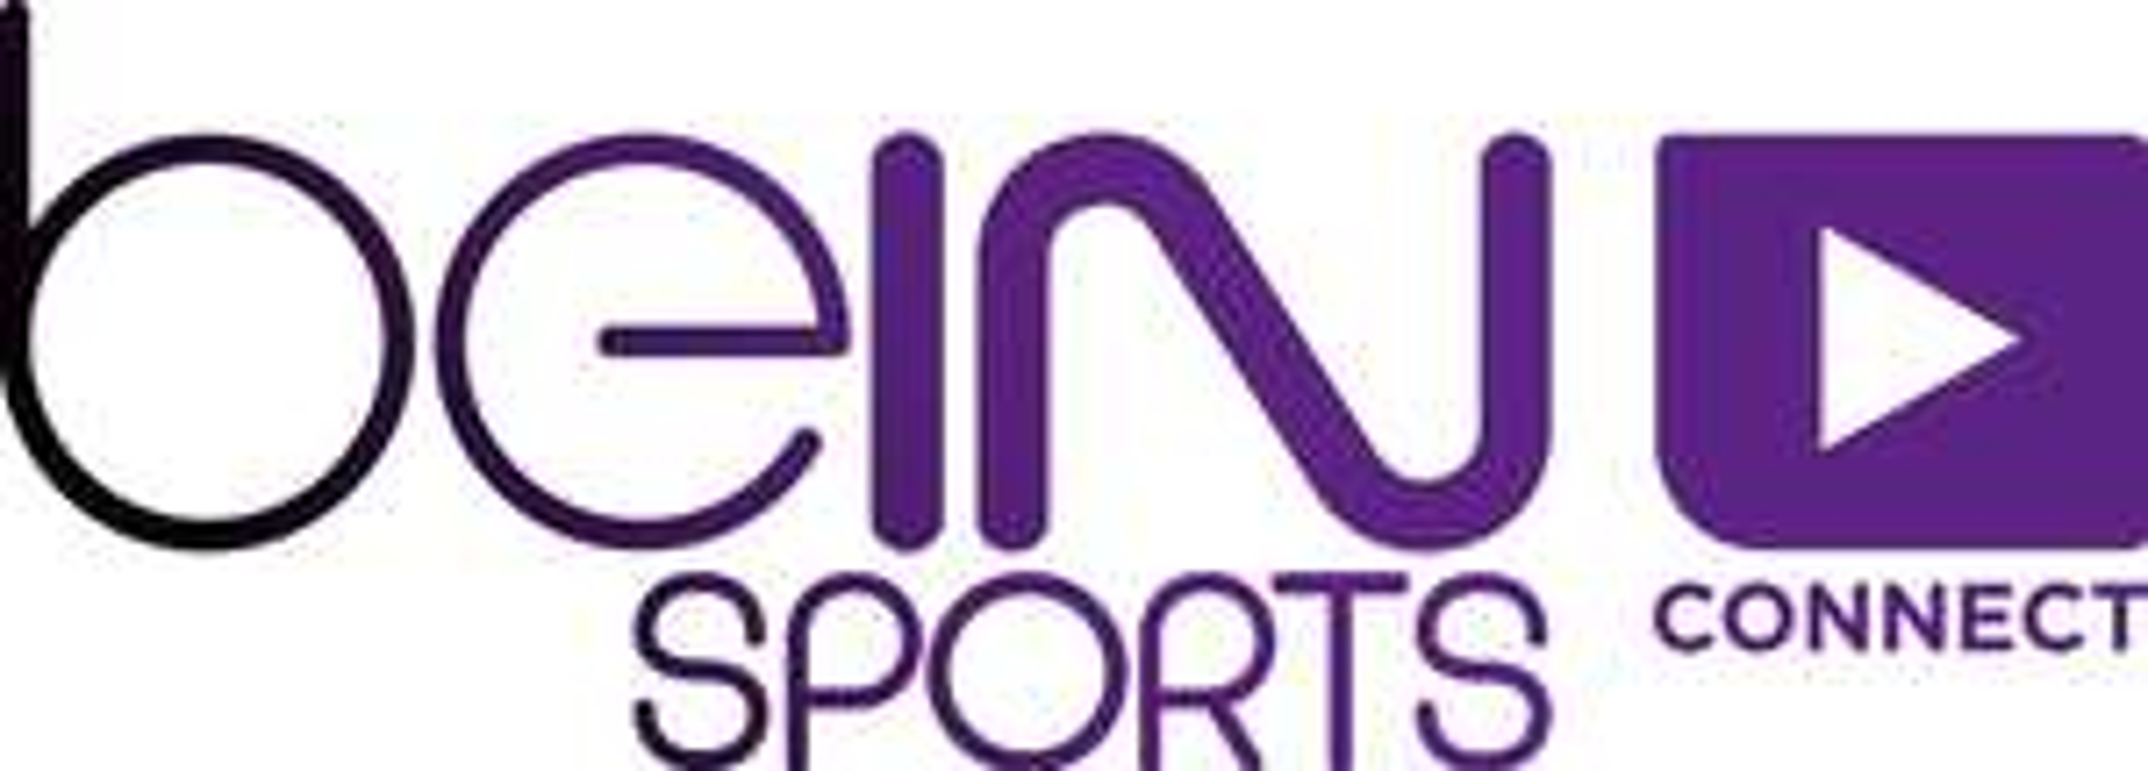 Abonnement beIN Sports Connect - 6 mois à 42€ ou 1 an